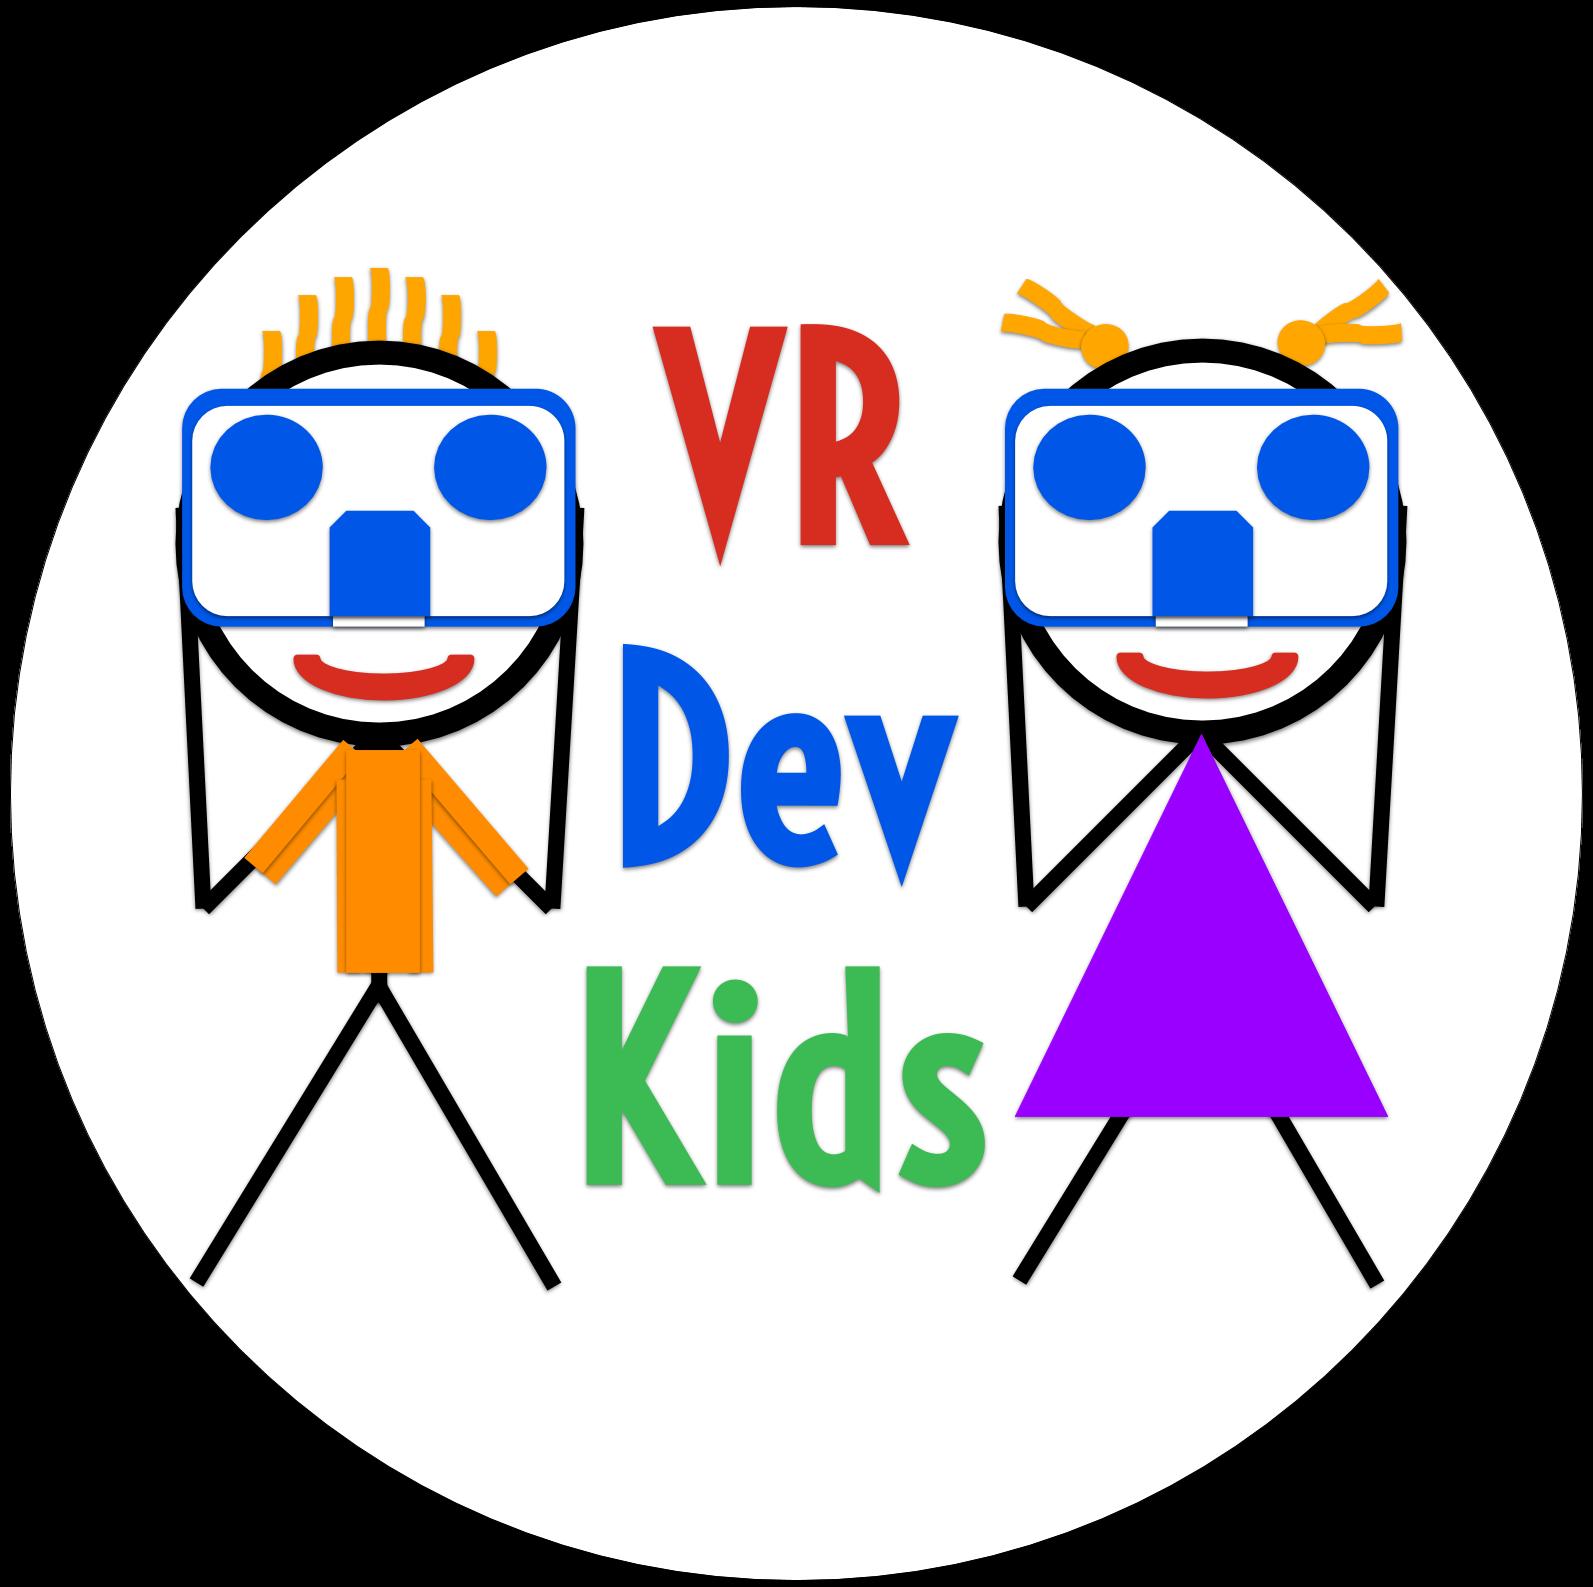 VR Dev Kids Logo